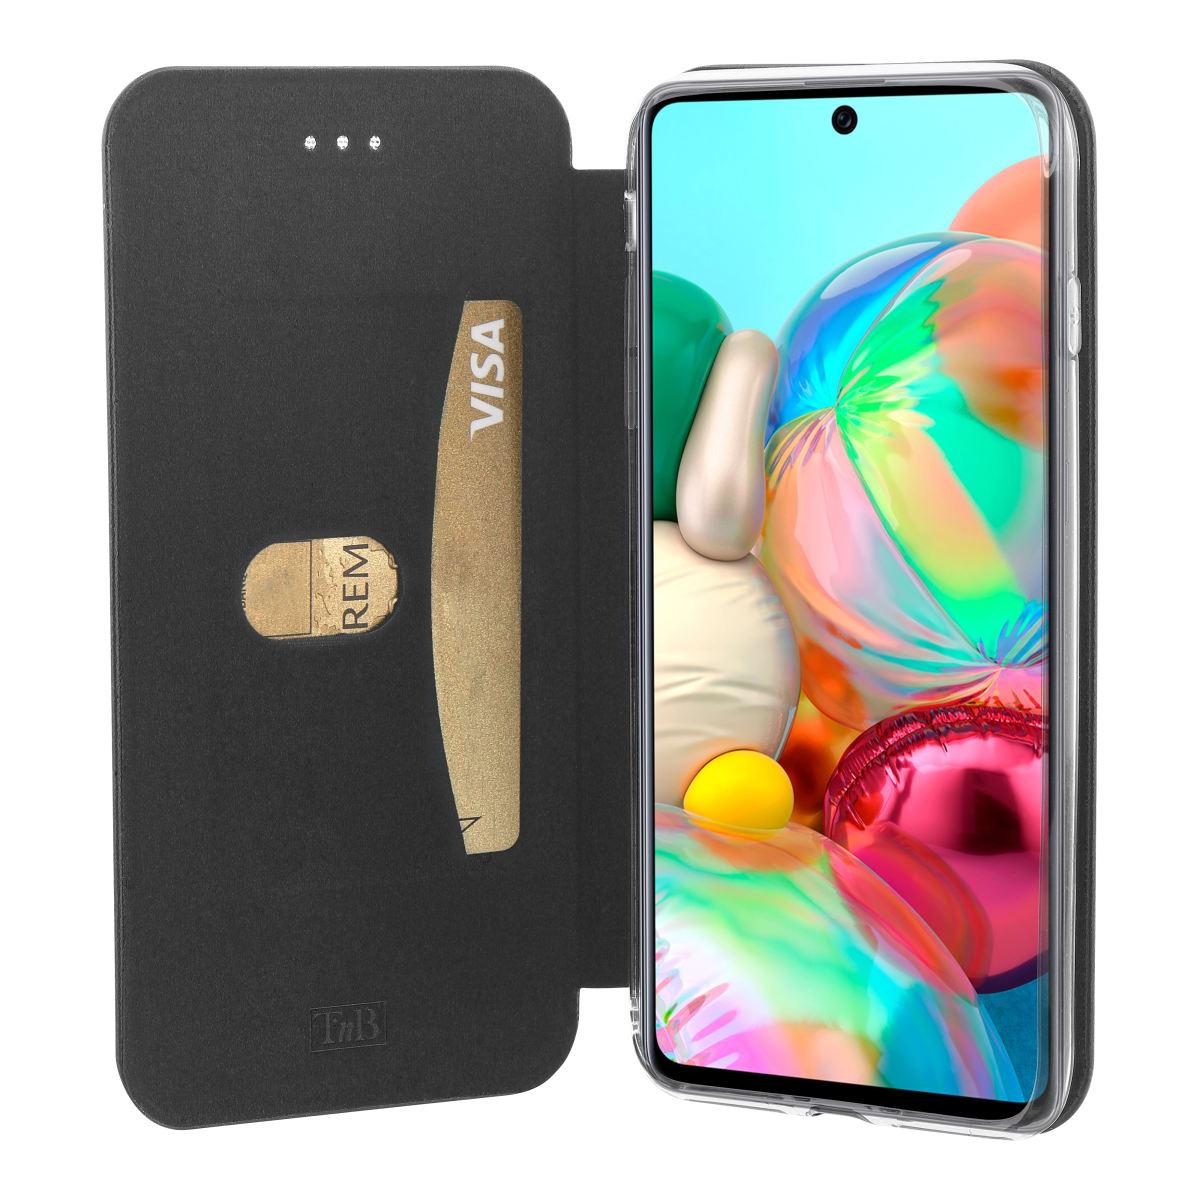 Premium folio case for Samsung Galaxy A72 5G